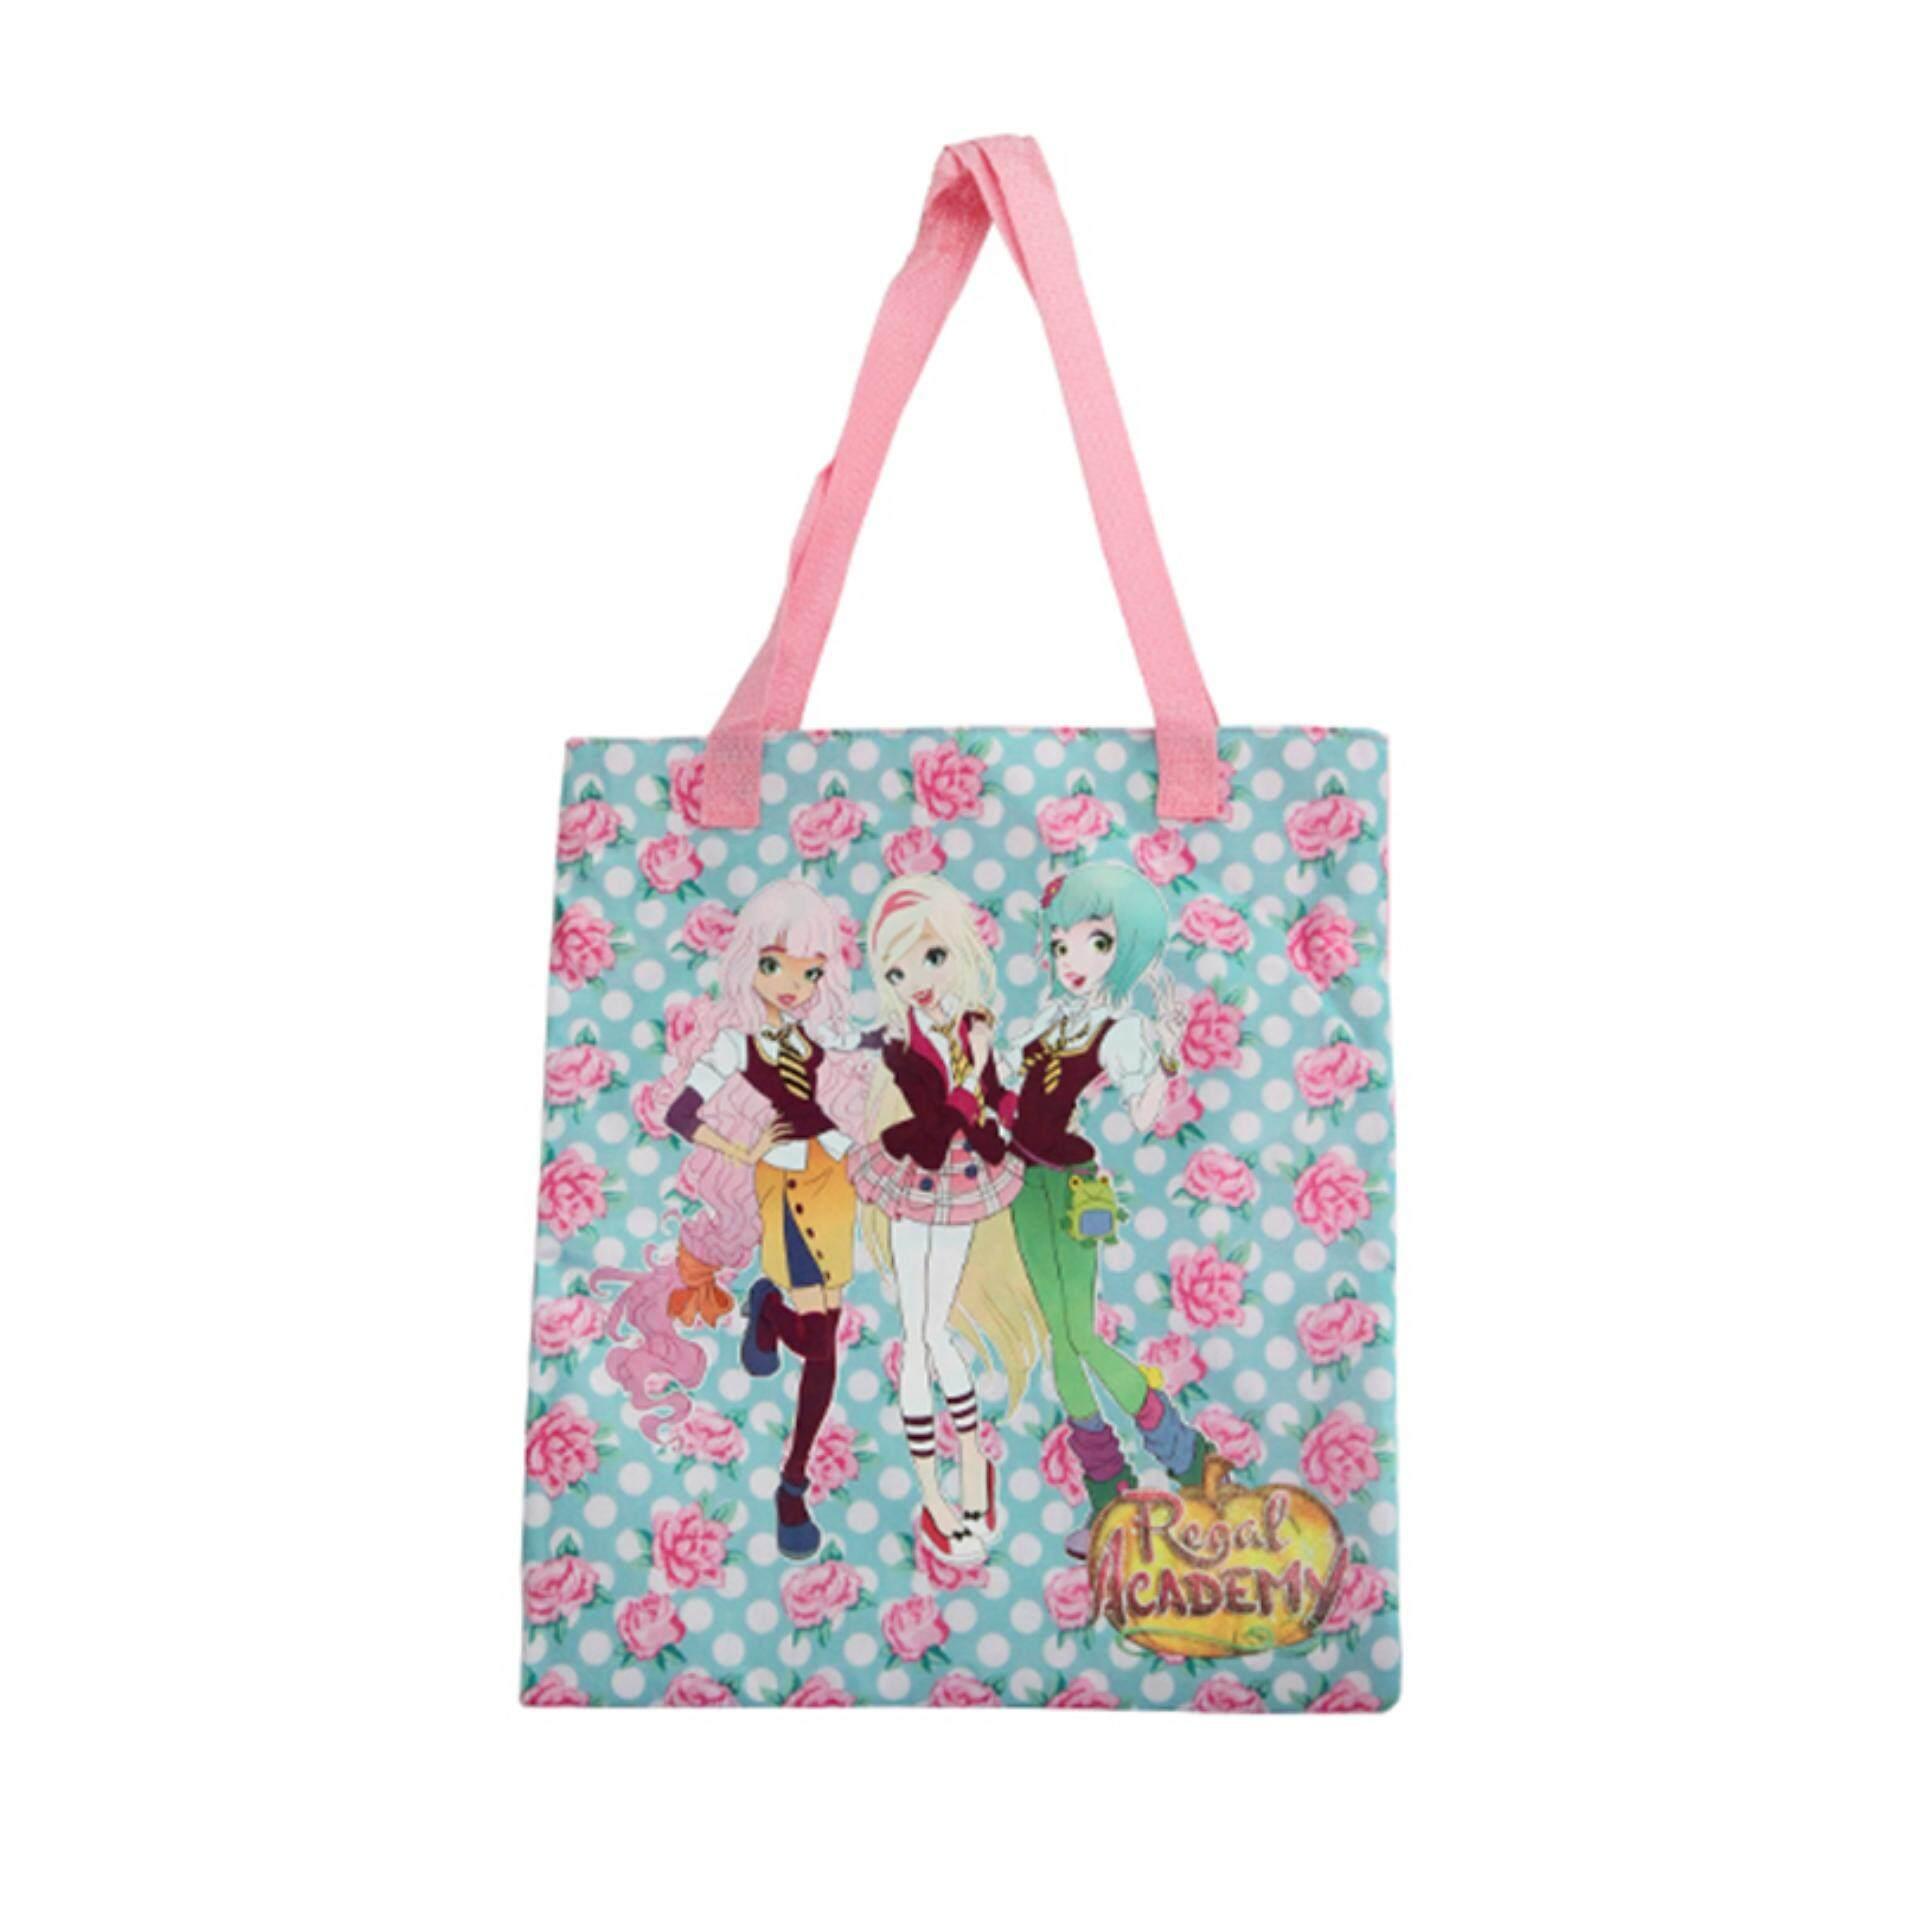 Regal Academy Tote Bag - Pink Colour